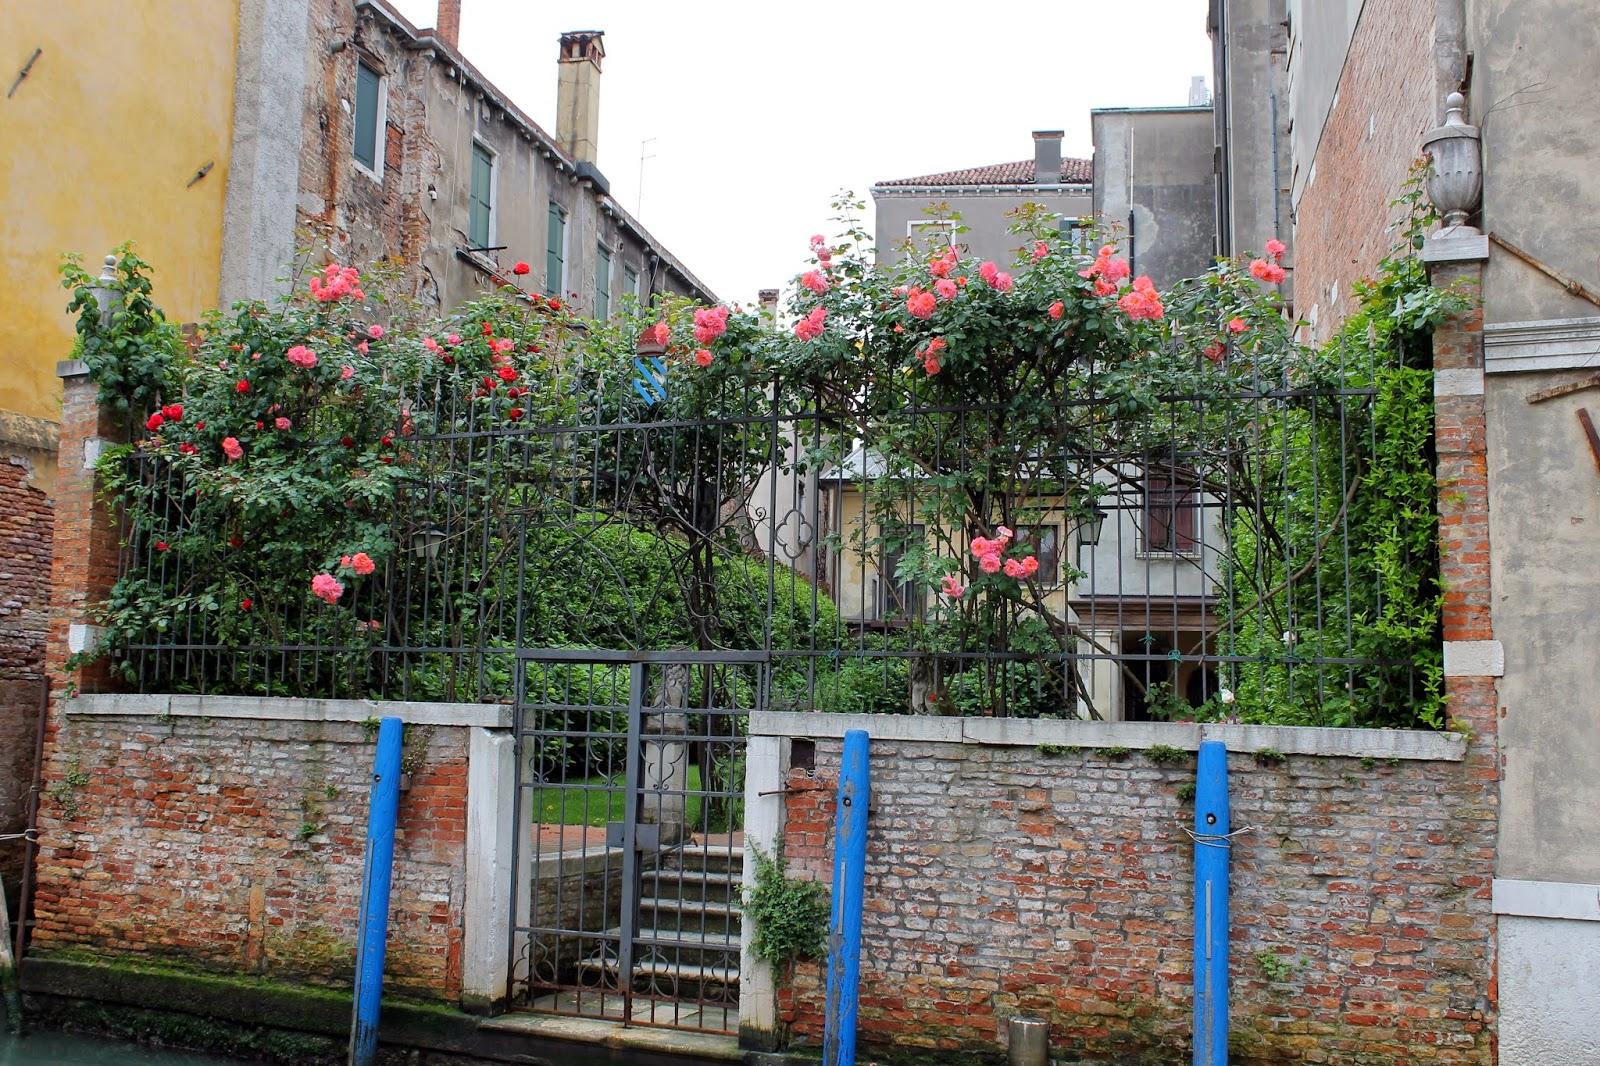 Jardins fleuris images for Jardin fleuri lyon 9